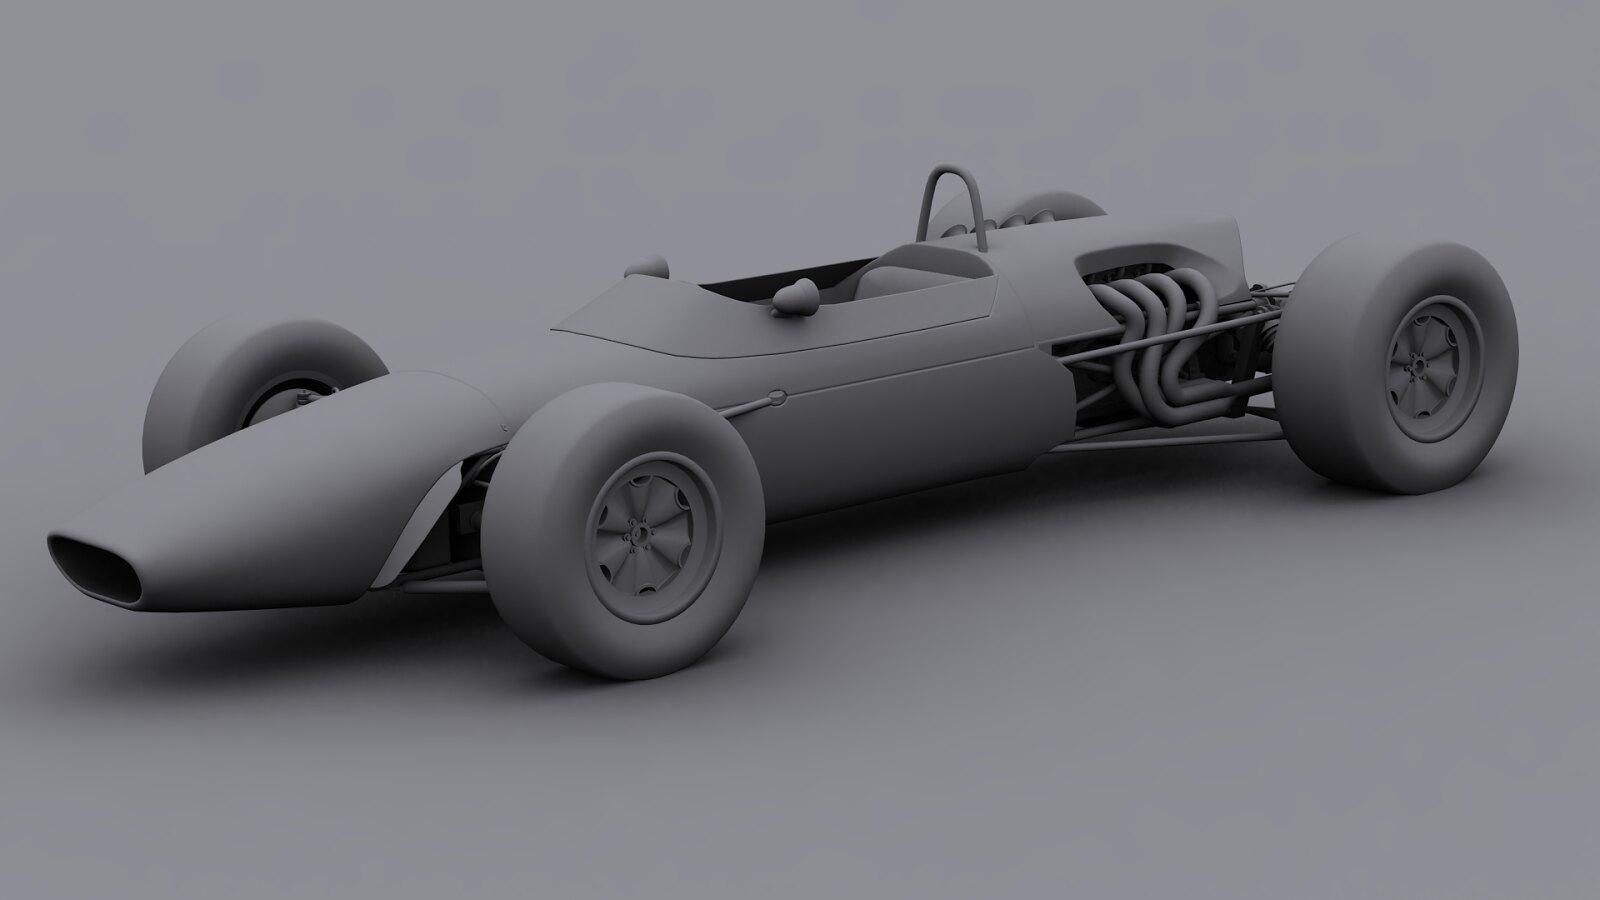 rFactor 2 - 1967 Formula 2 Mod Bt23